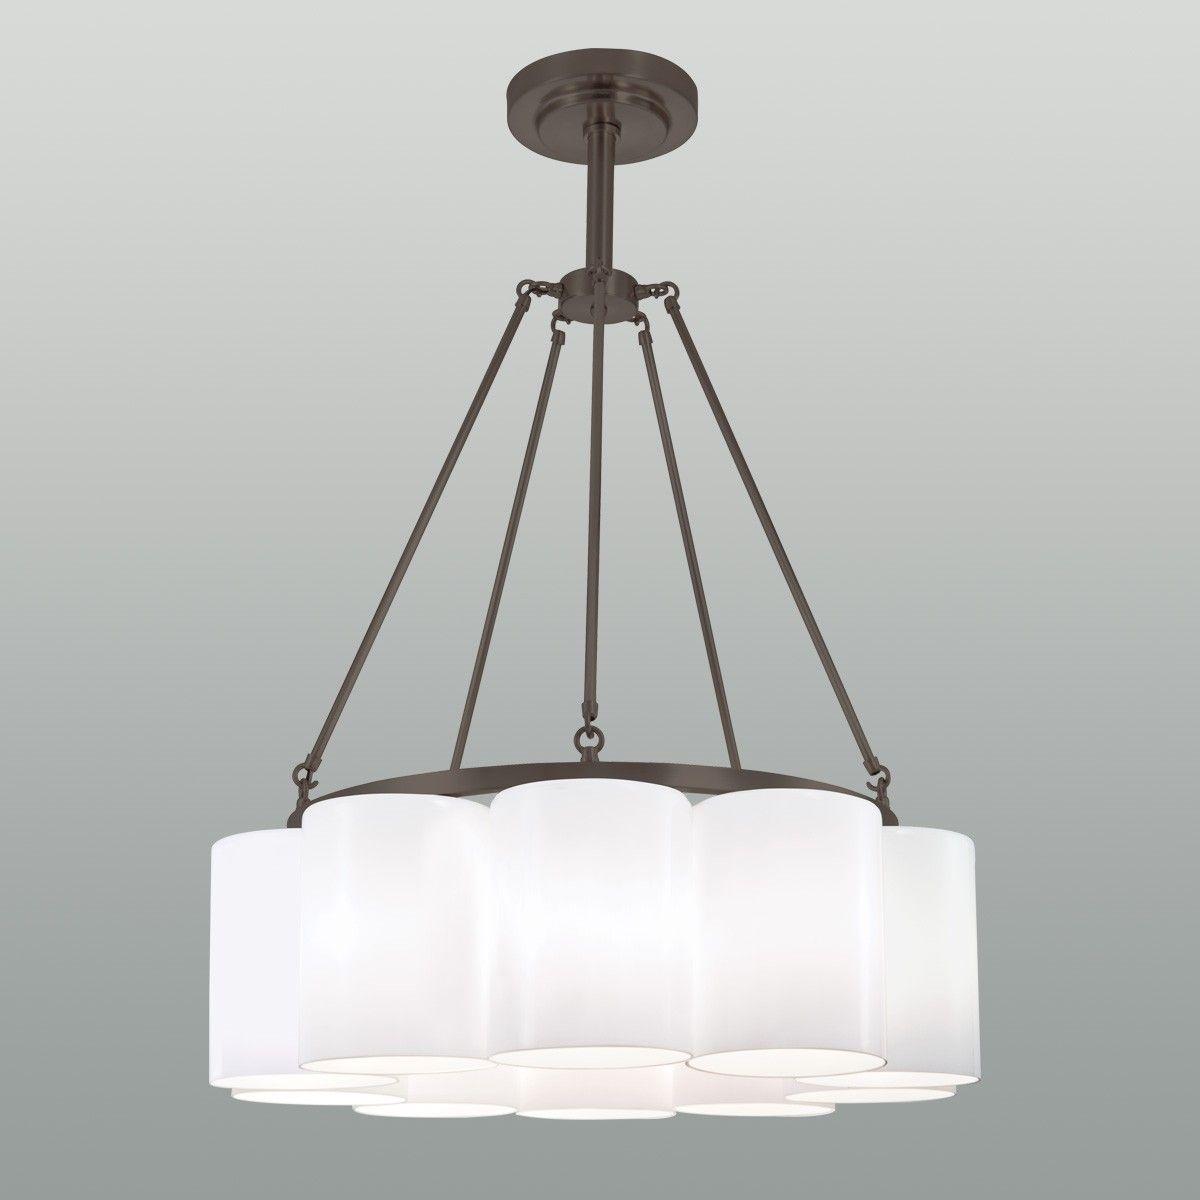 Ilex architecural lighting gala pendant pendants u chandeliers